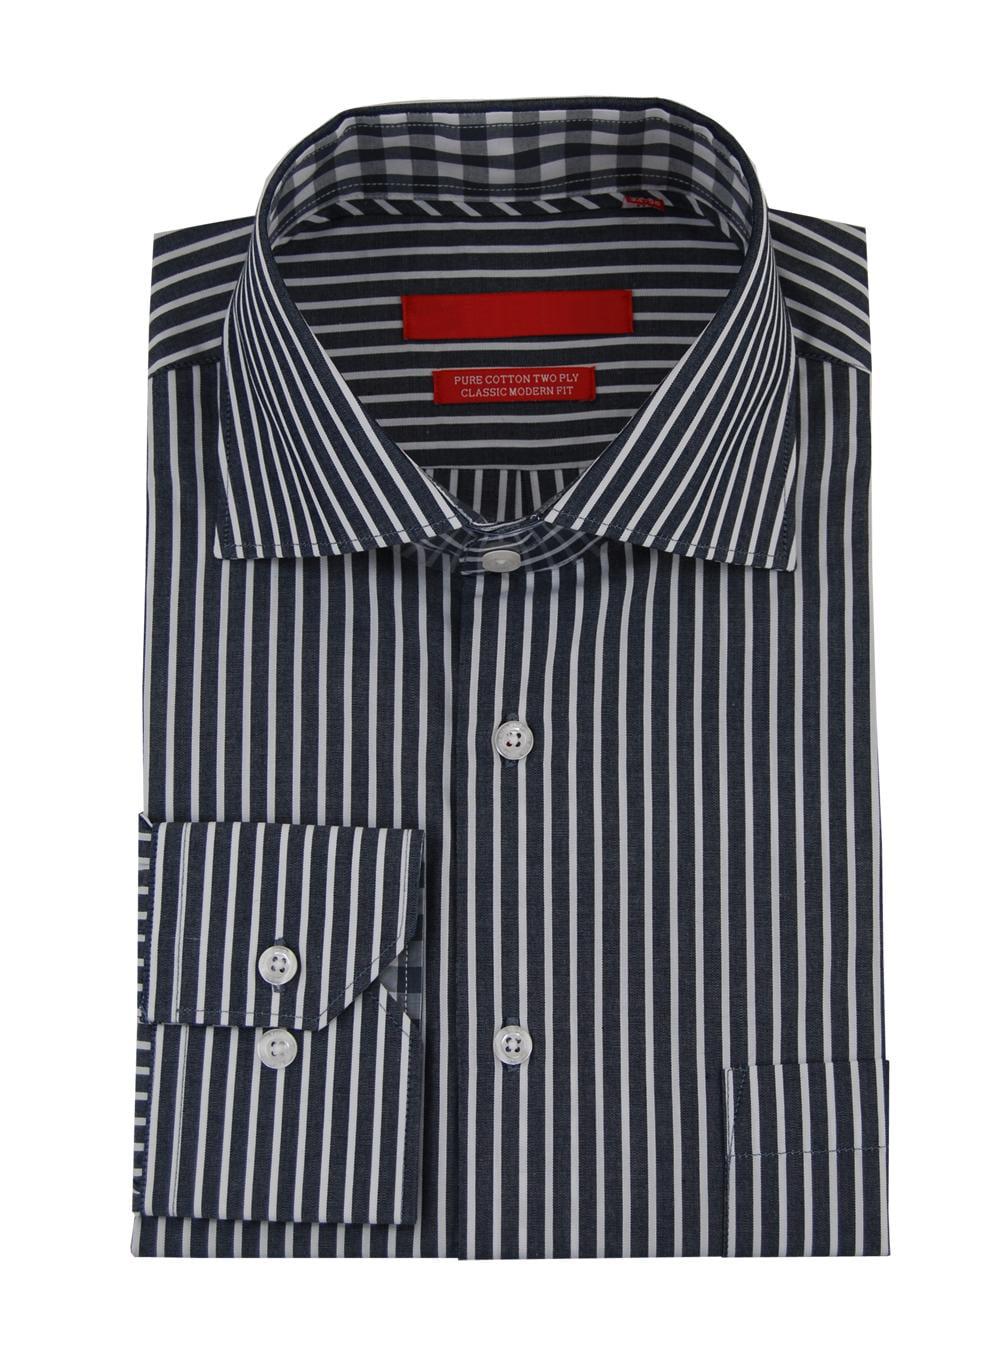 DTI GV Executive Mens Stripe Dress Shirt Cotton Spread Collar French Cuff